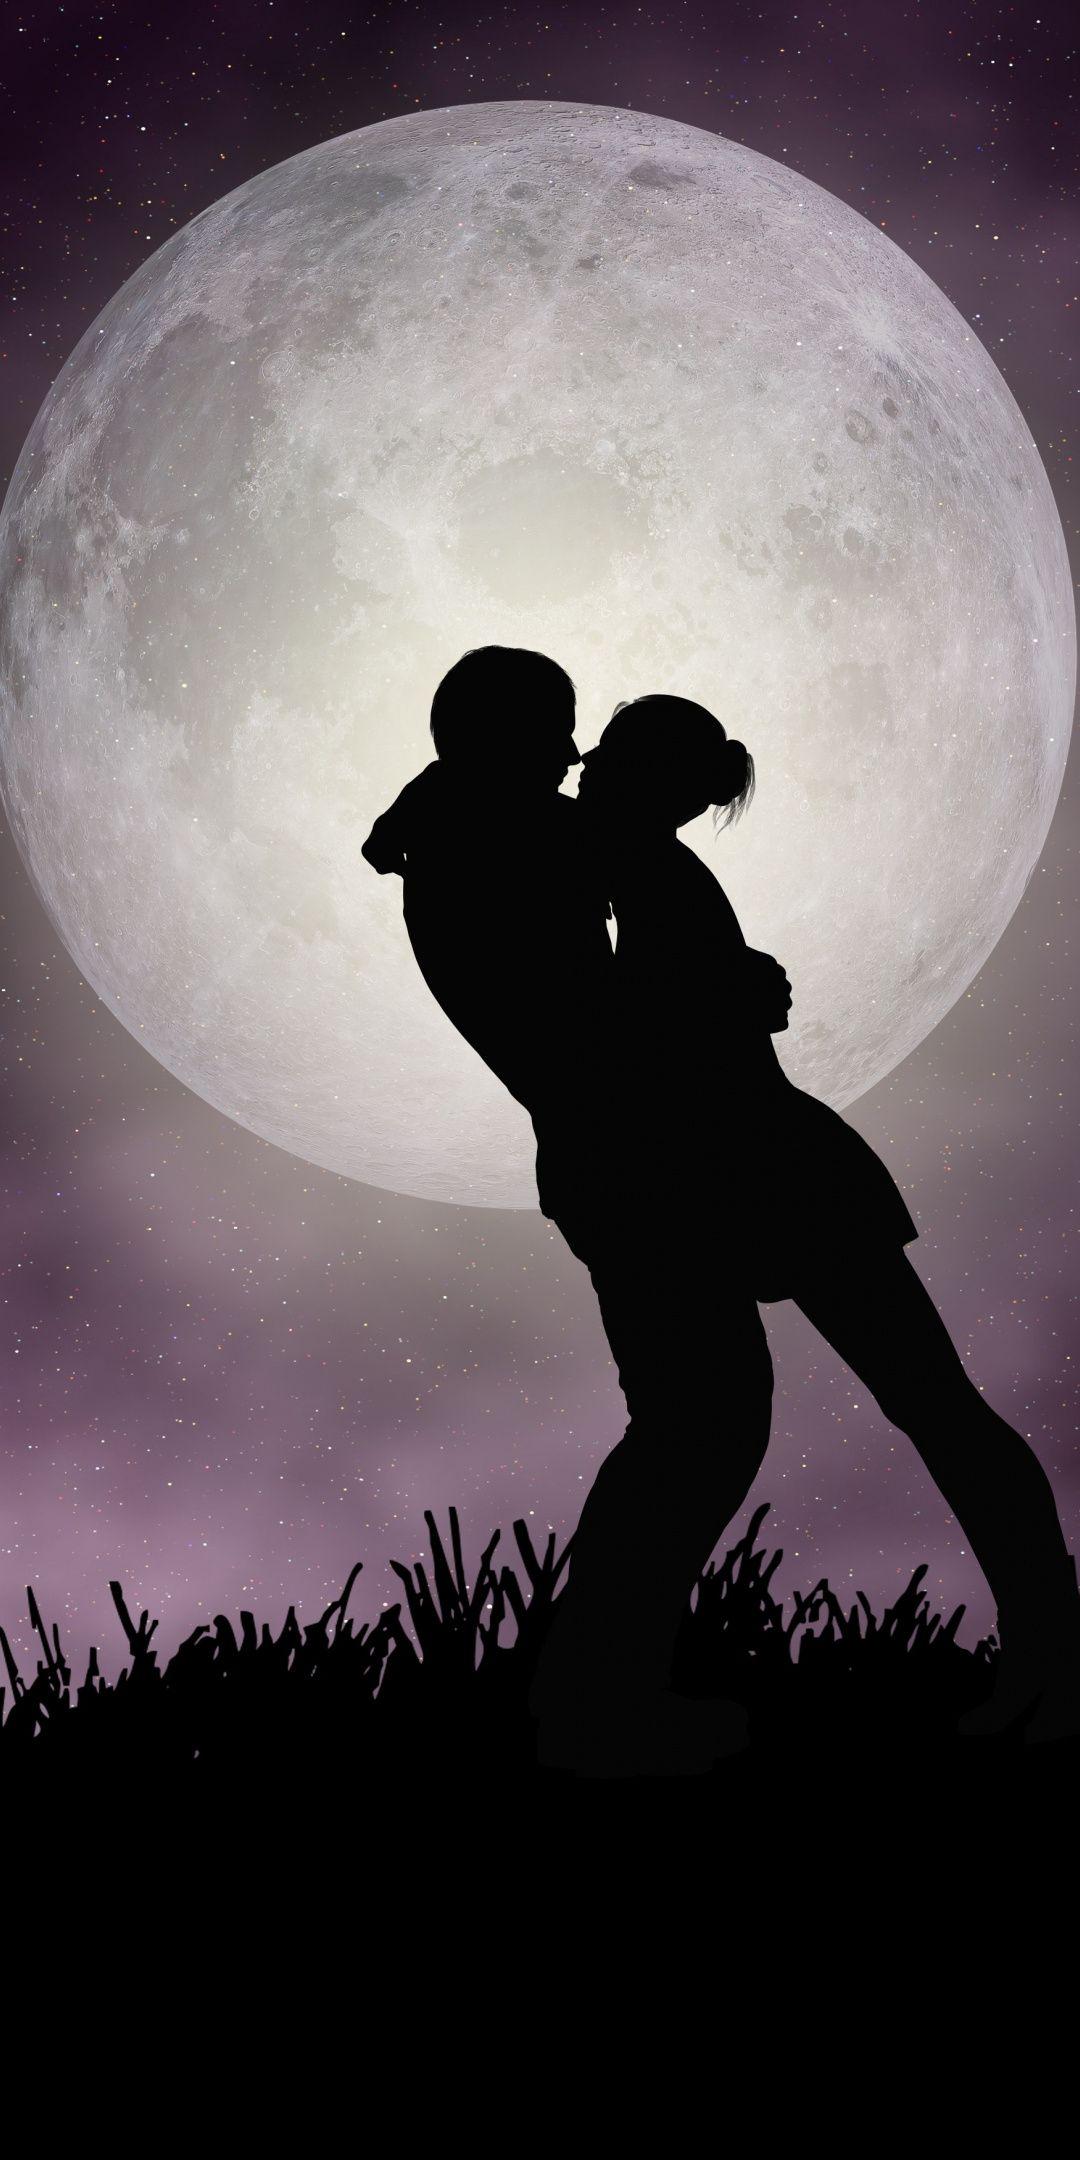 Moon Romantic Night Couple Silhouette Art 1080x2160 Wallpaper Romantic Wallpaper Silhouette Art Art Wallpaper